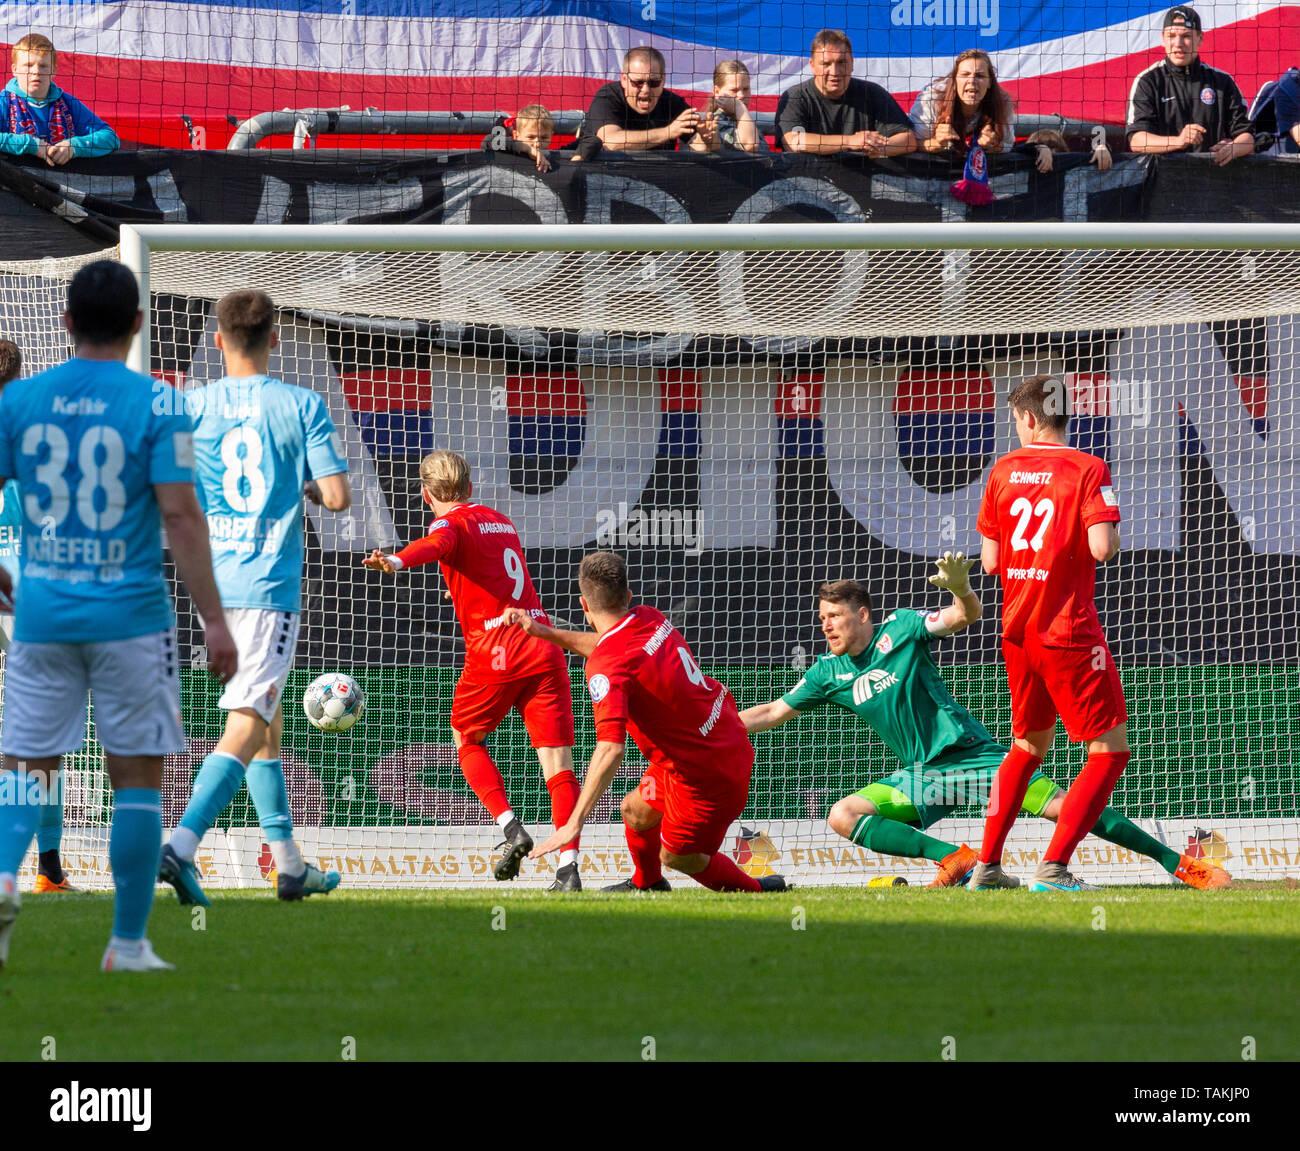 Sport, Fussball, Reviersport Niederrheinpokal, 2018/2019, Finale, Wuppertaler SV vs. KFC Uerdingen 1-2, Stadion Am Zoo in Wuppertal, Riesentorchance, v.l.n.r. Oguzhan Kefkir (KFC), Maurice Jerome Litka (KFC), Kevin Hagemann (WSV), Gino Windmueller (WSV), Torwart Rene Vollath (KFC), Peter Schmetz (WSV), sports, football, Lower Rhine Cup, 2018/2019, final, Wuppertaler SV vs. KFC Uerdingen 1-2, Stadium Am Zoo in Wuppertal, great opportunity, f.l.t.r. Oguzhan Kefkir (KFC), Maurice Jerome Litka (KFC), Kevin Hagemann (WSV), Gino Windmueller (WSV), keeper Rene Vollath (KFC), Peter Schmetz (WSV) *** L - Stock Image